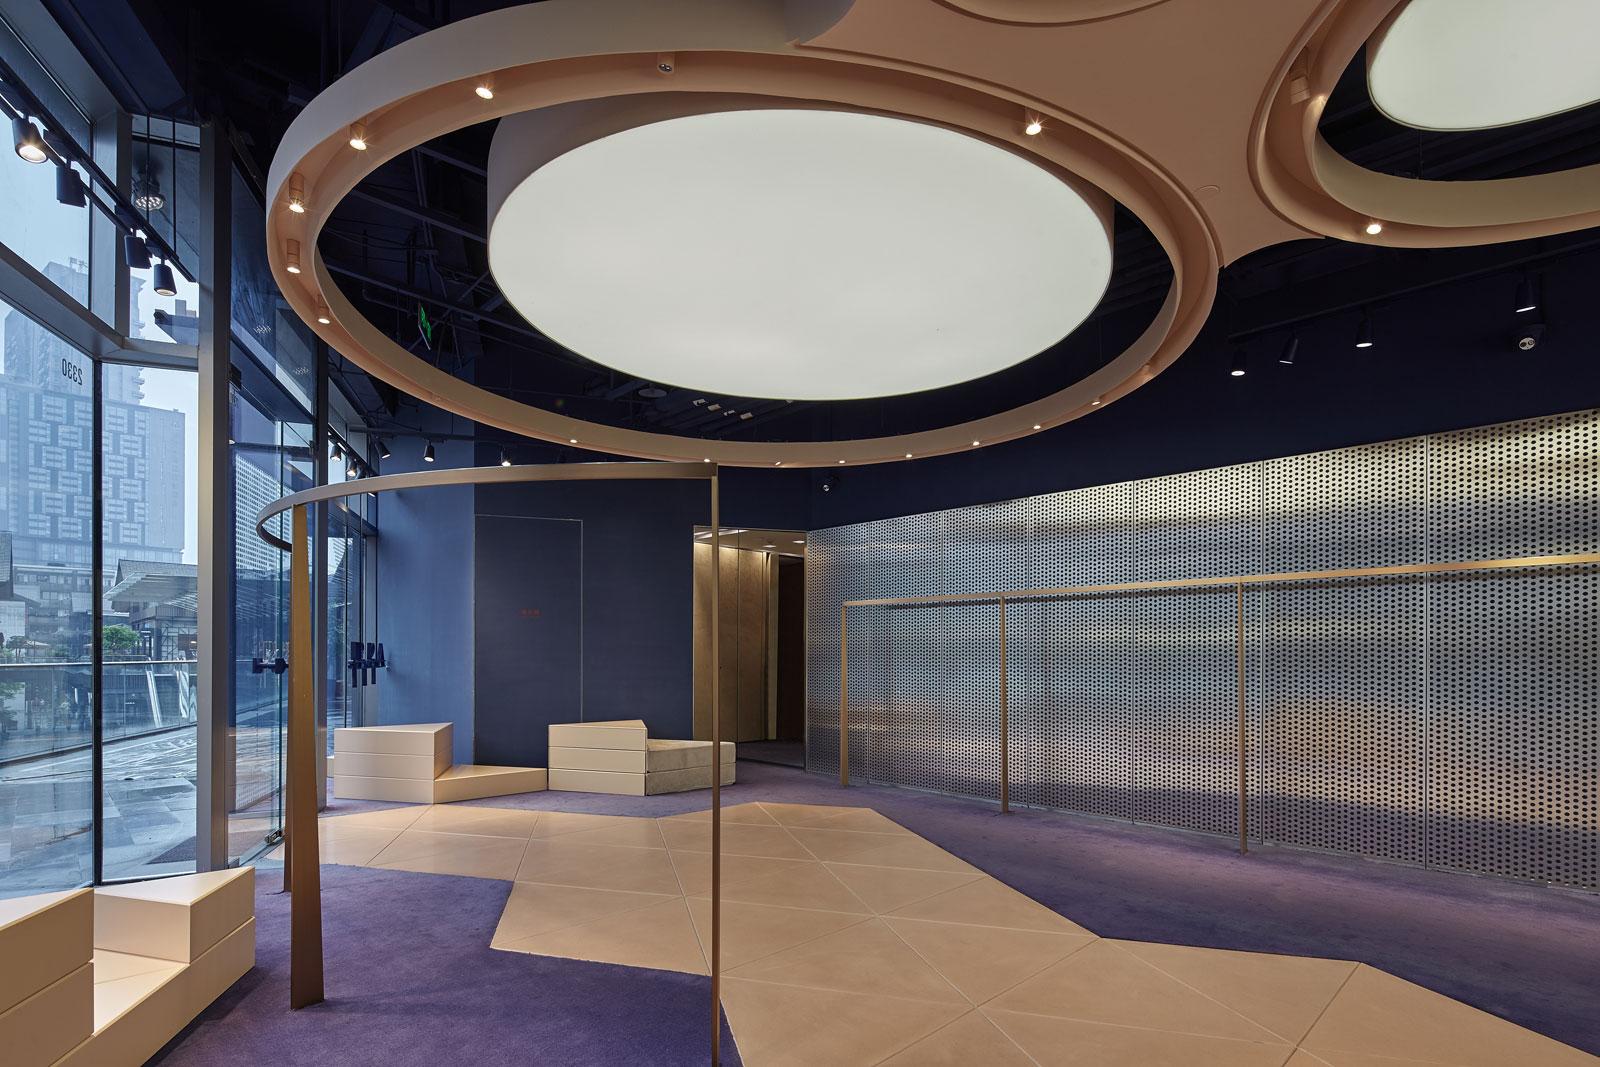 Anyshopstyle Chengdu Concept Store Project